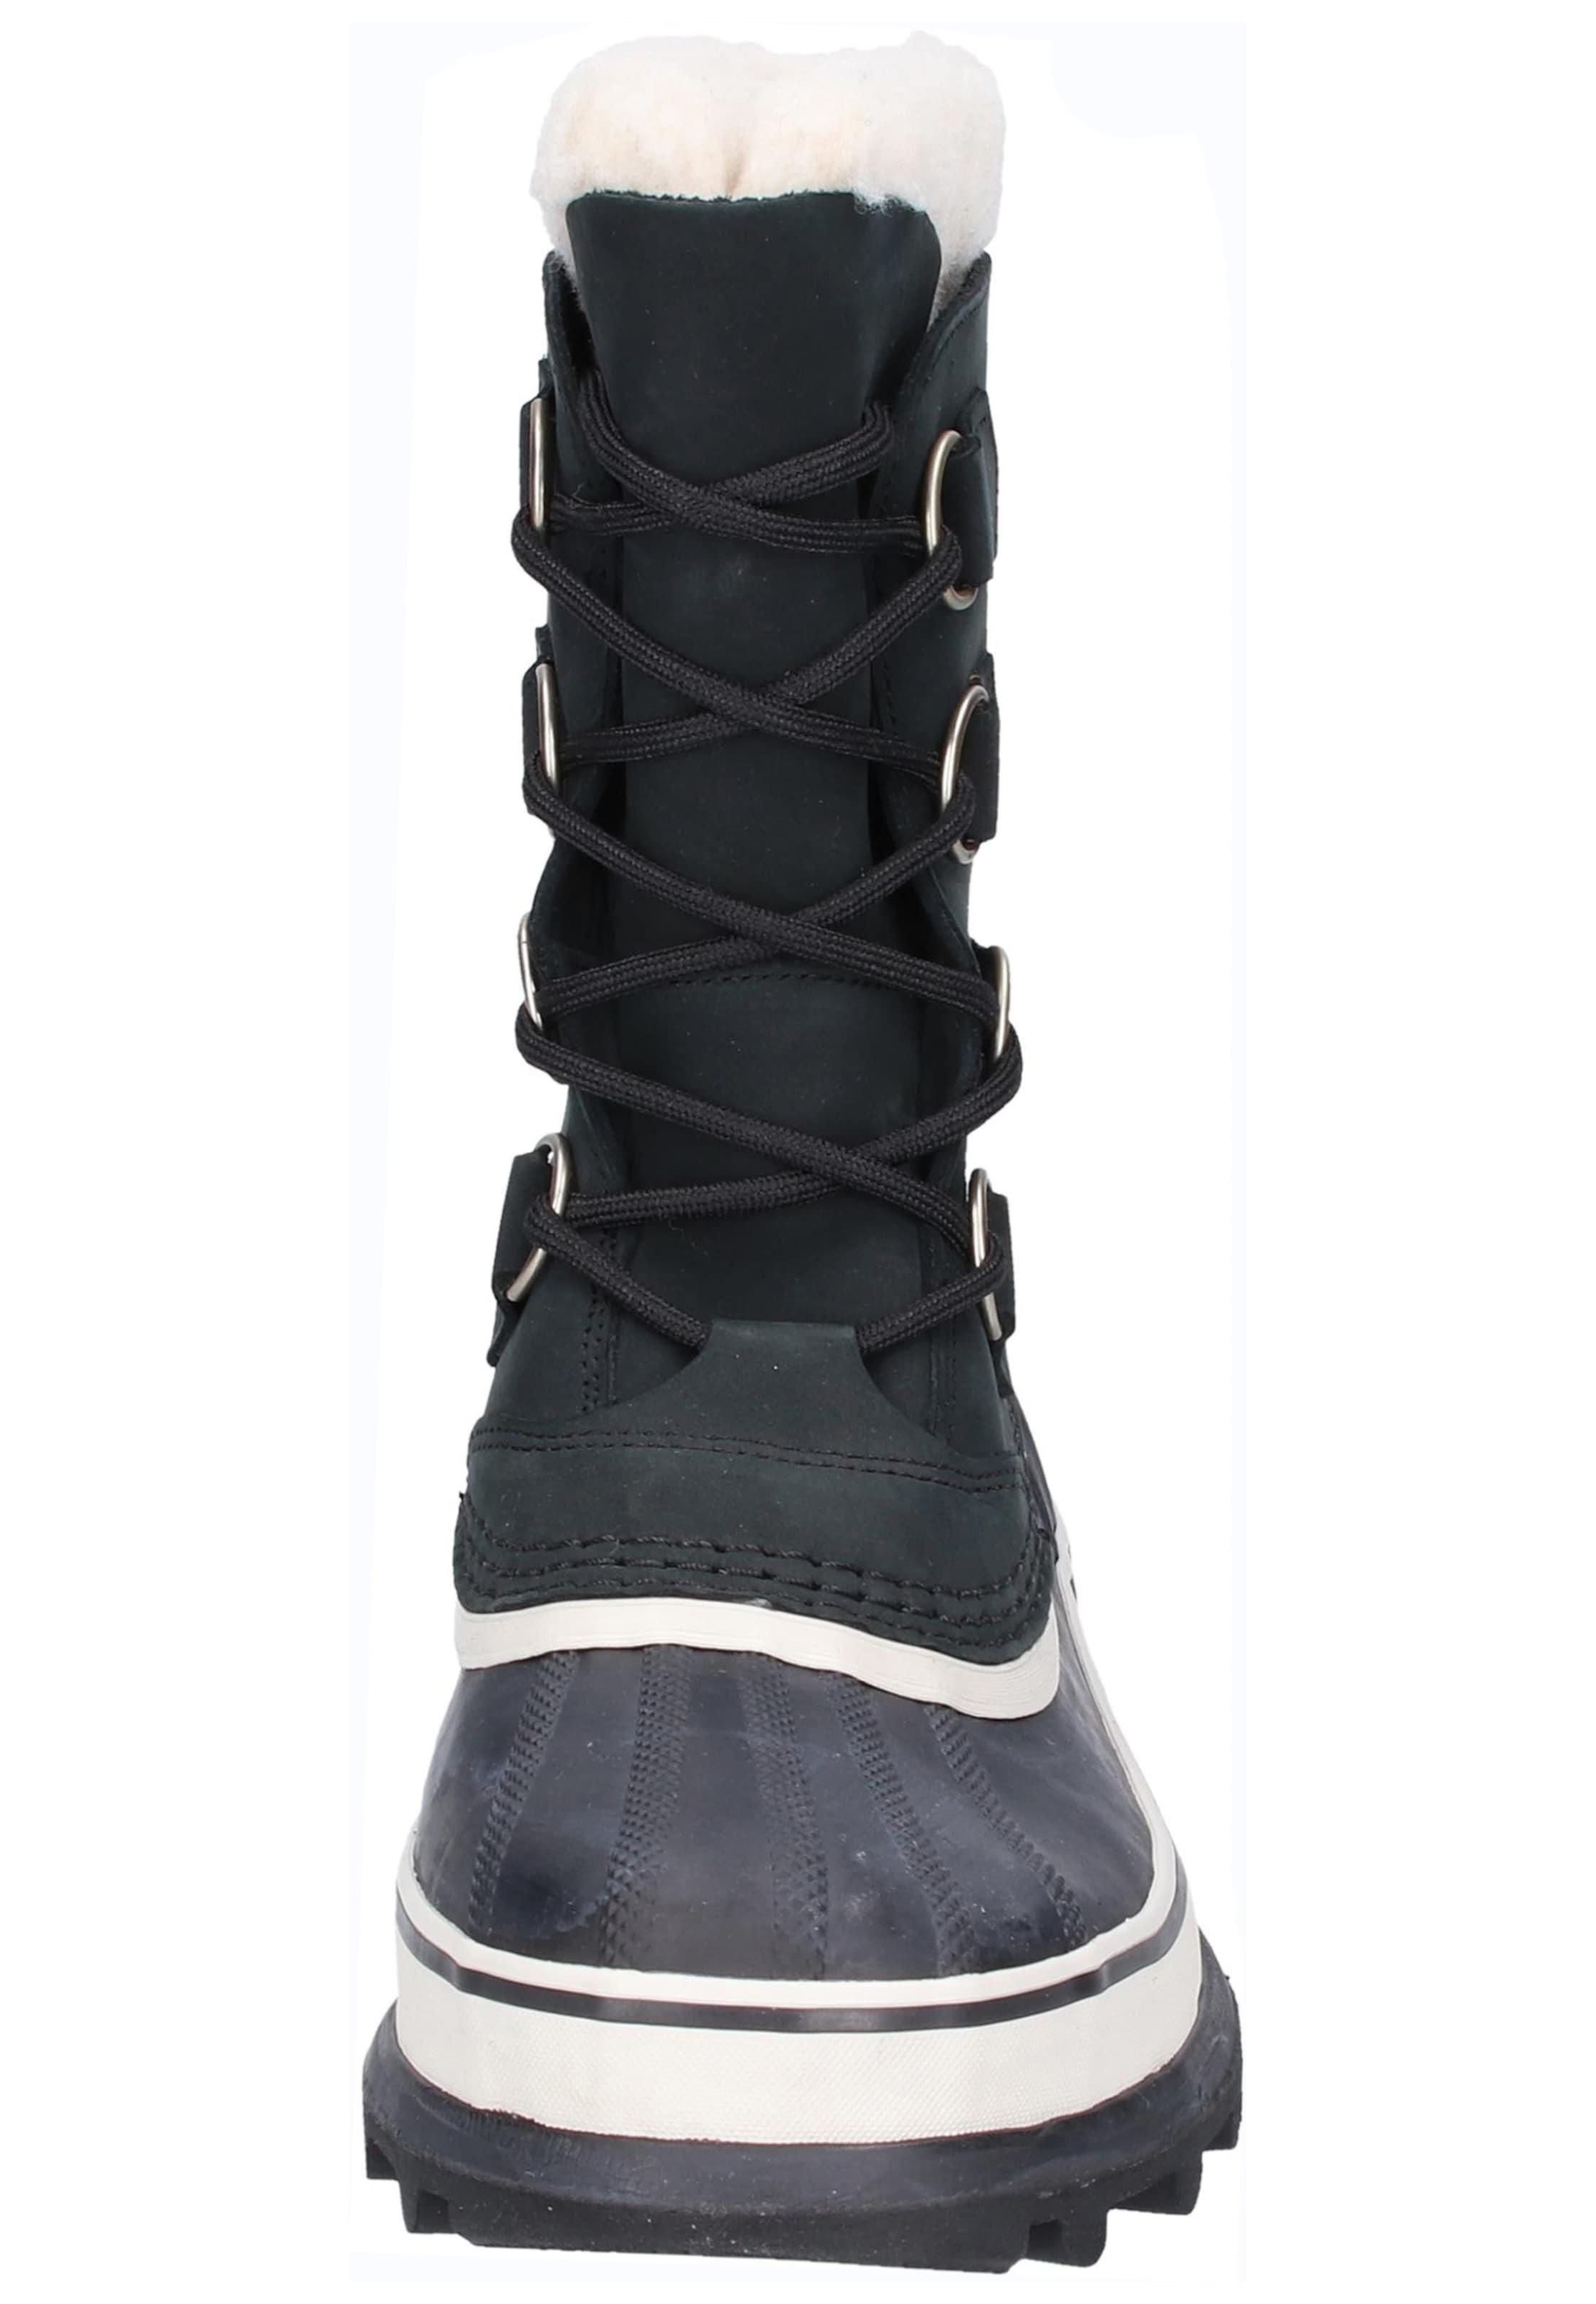 Stiefel Stiefel SchwarzWeiß Sorel In Sorel jA35R4L